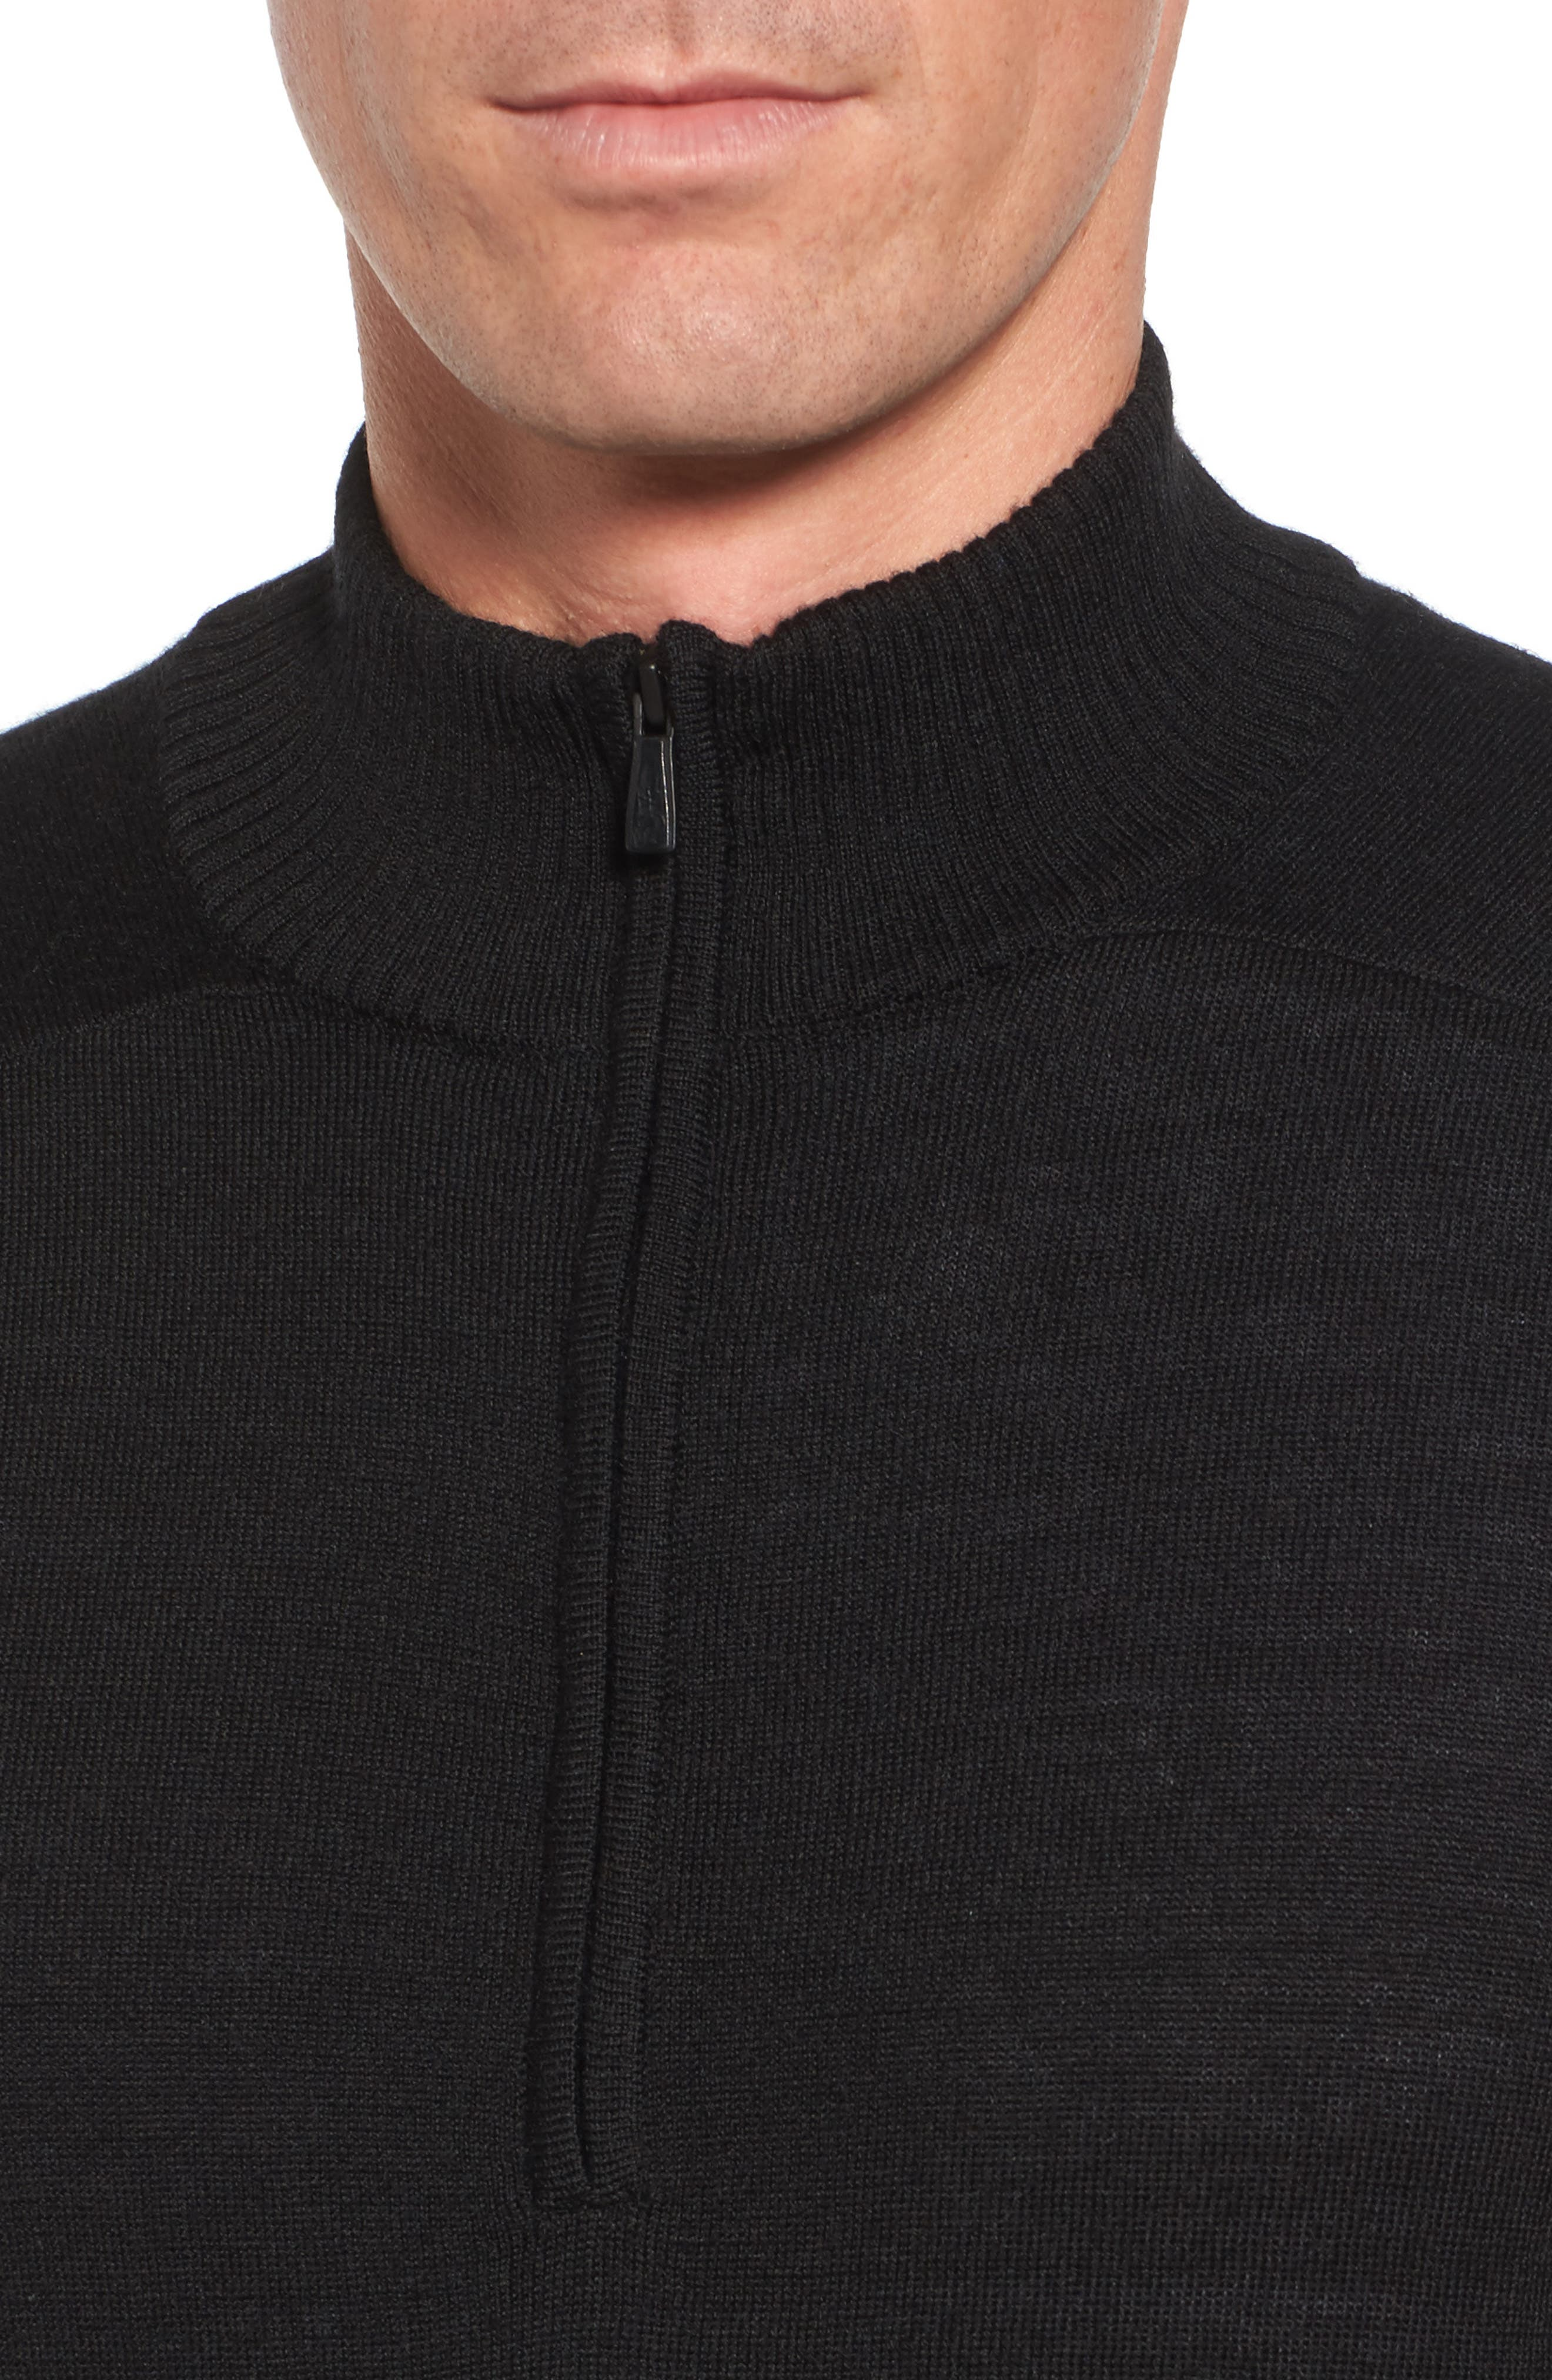 Kiva Ridge Merino Wool Blend Pullover,                             Alternate thumbnail 4, color,                             Black